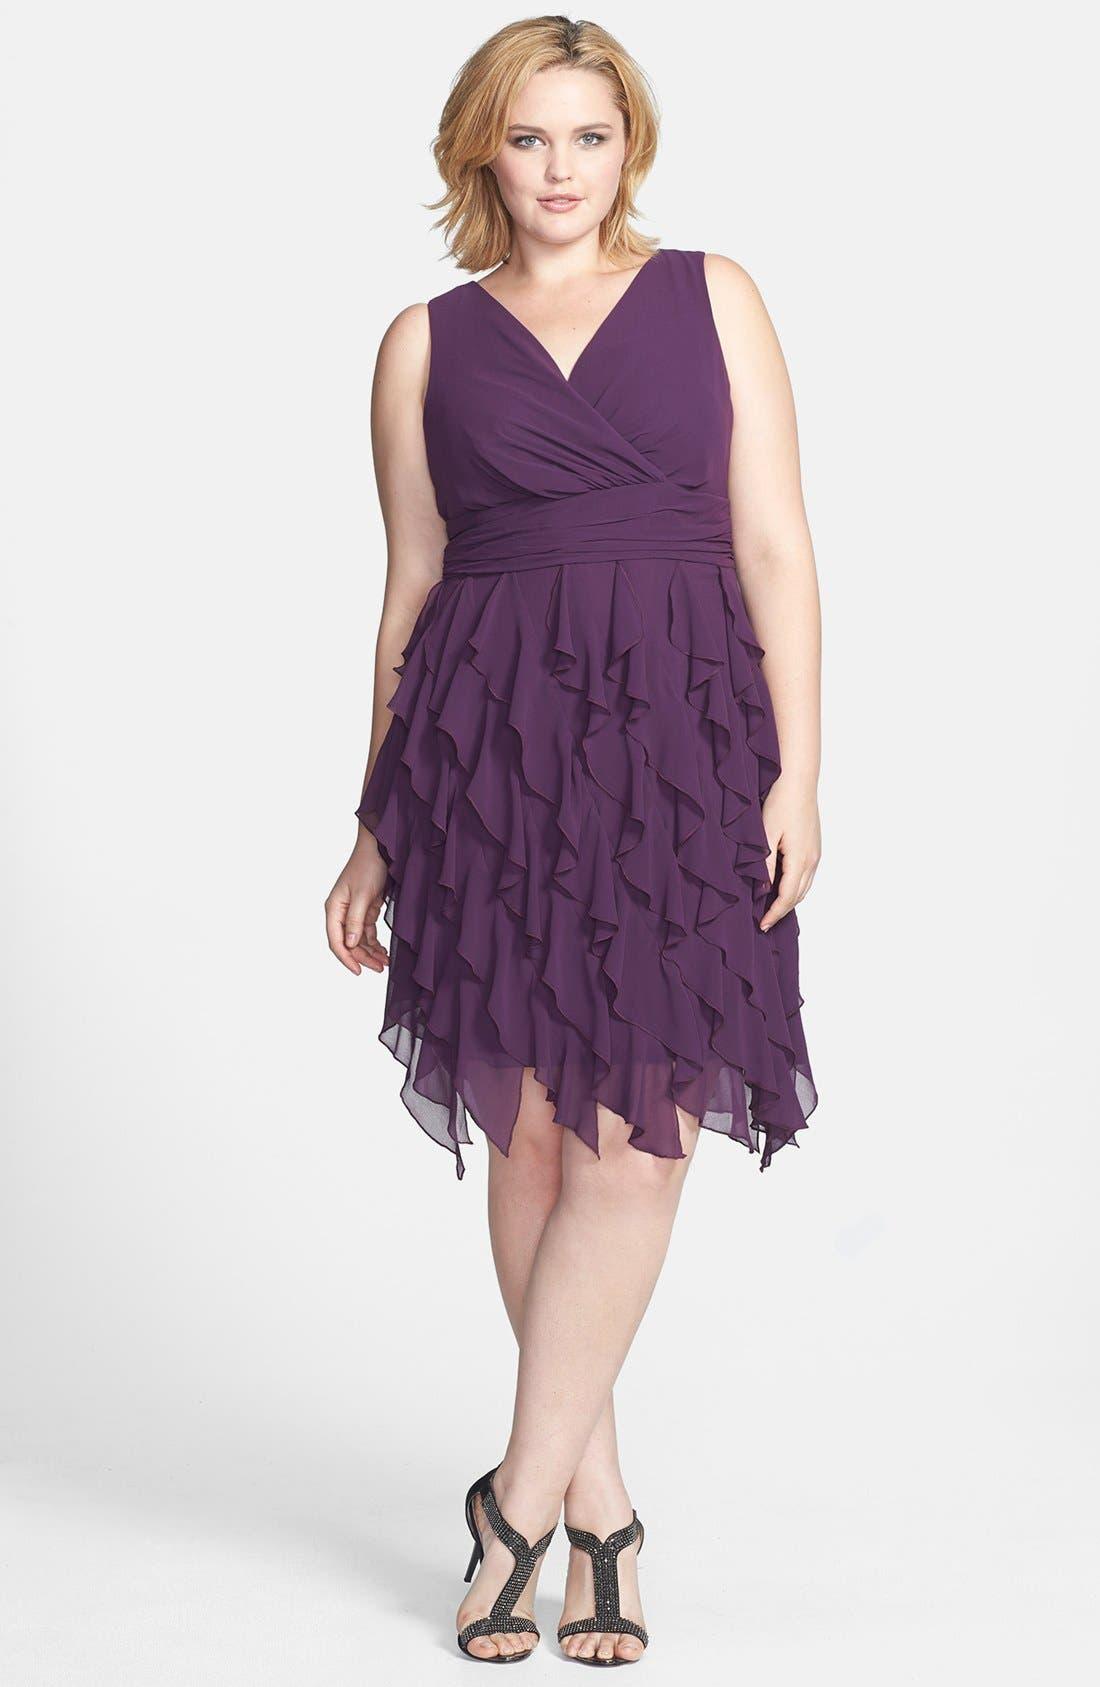 Alternate Image 1 Selected - Ivy & Blu V-Neck Ruffled Skirt Chiffon Dress (Plus Size)